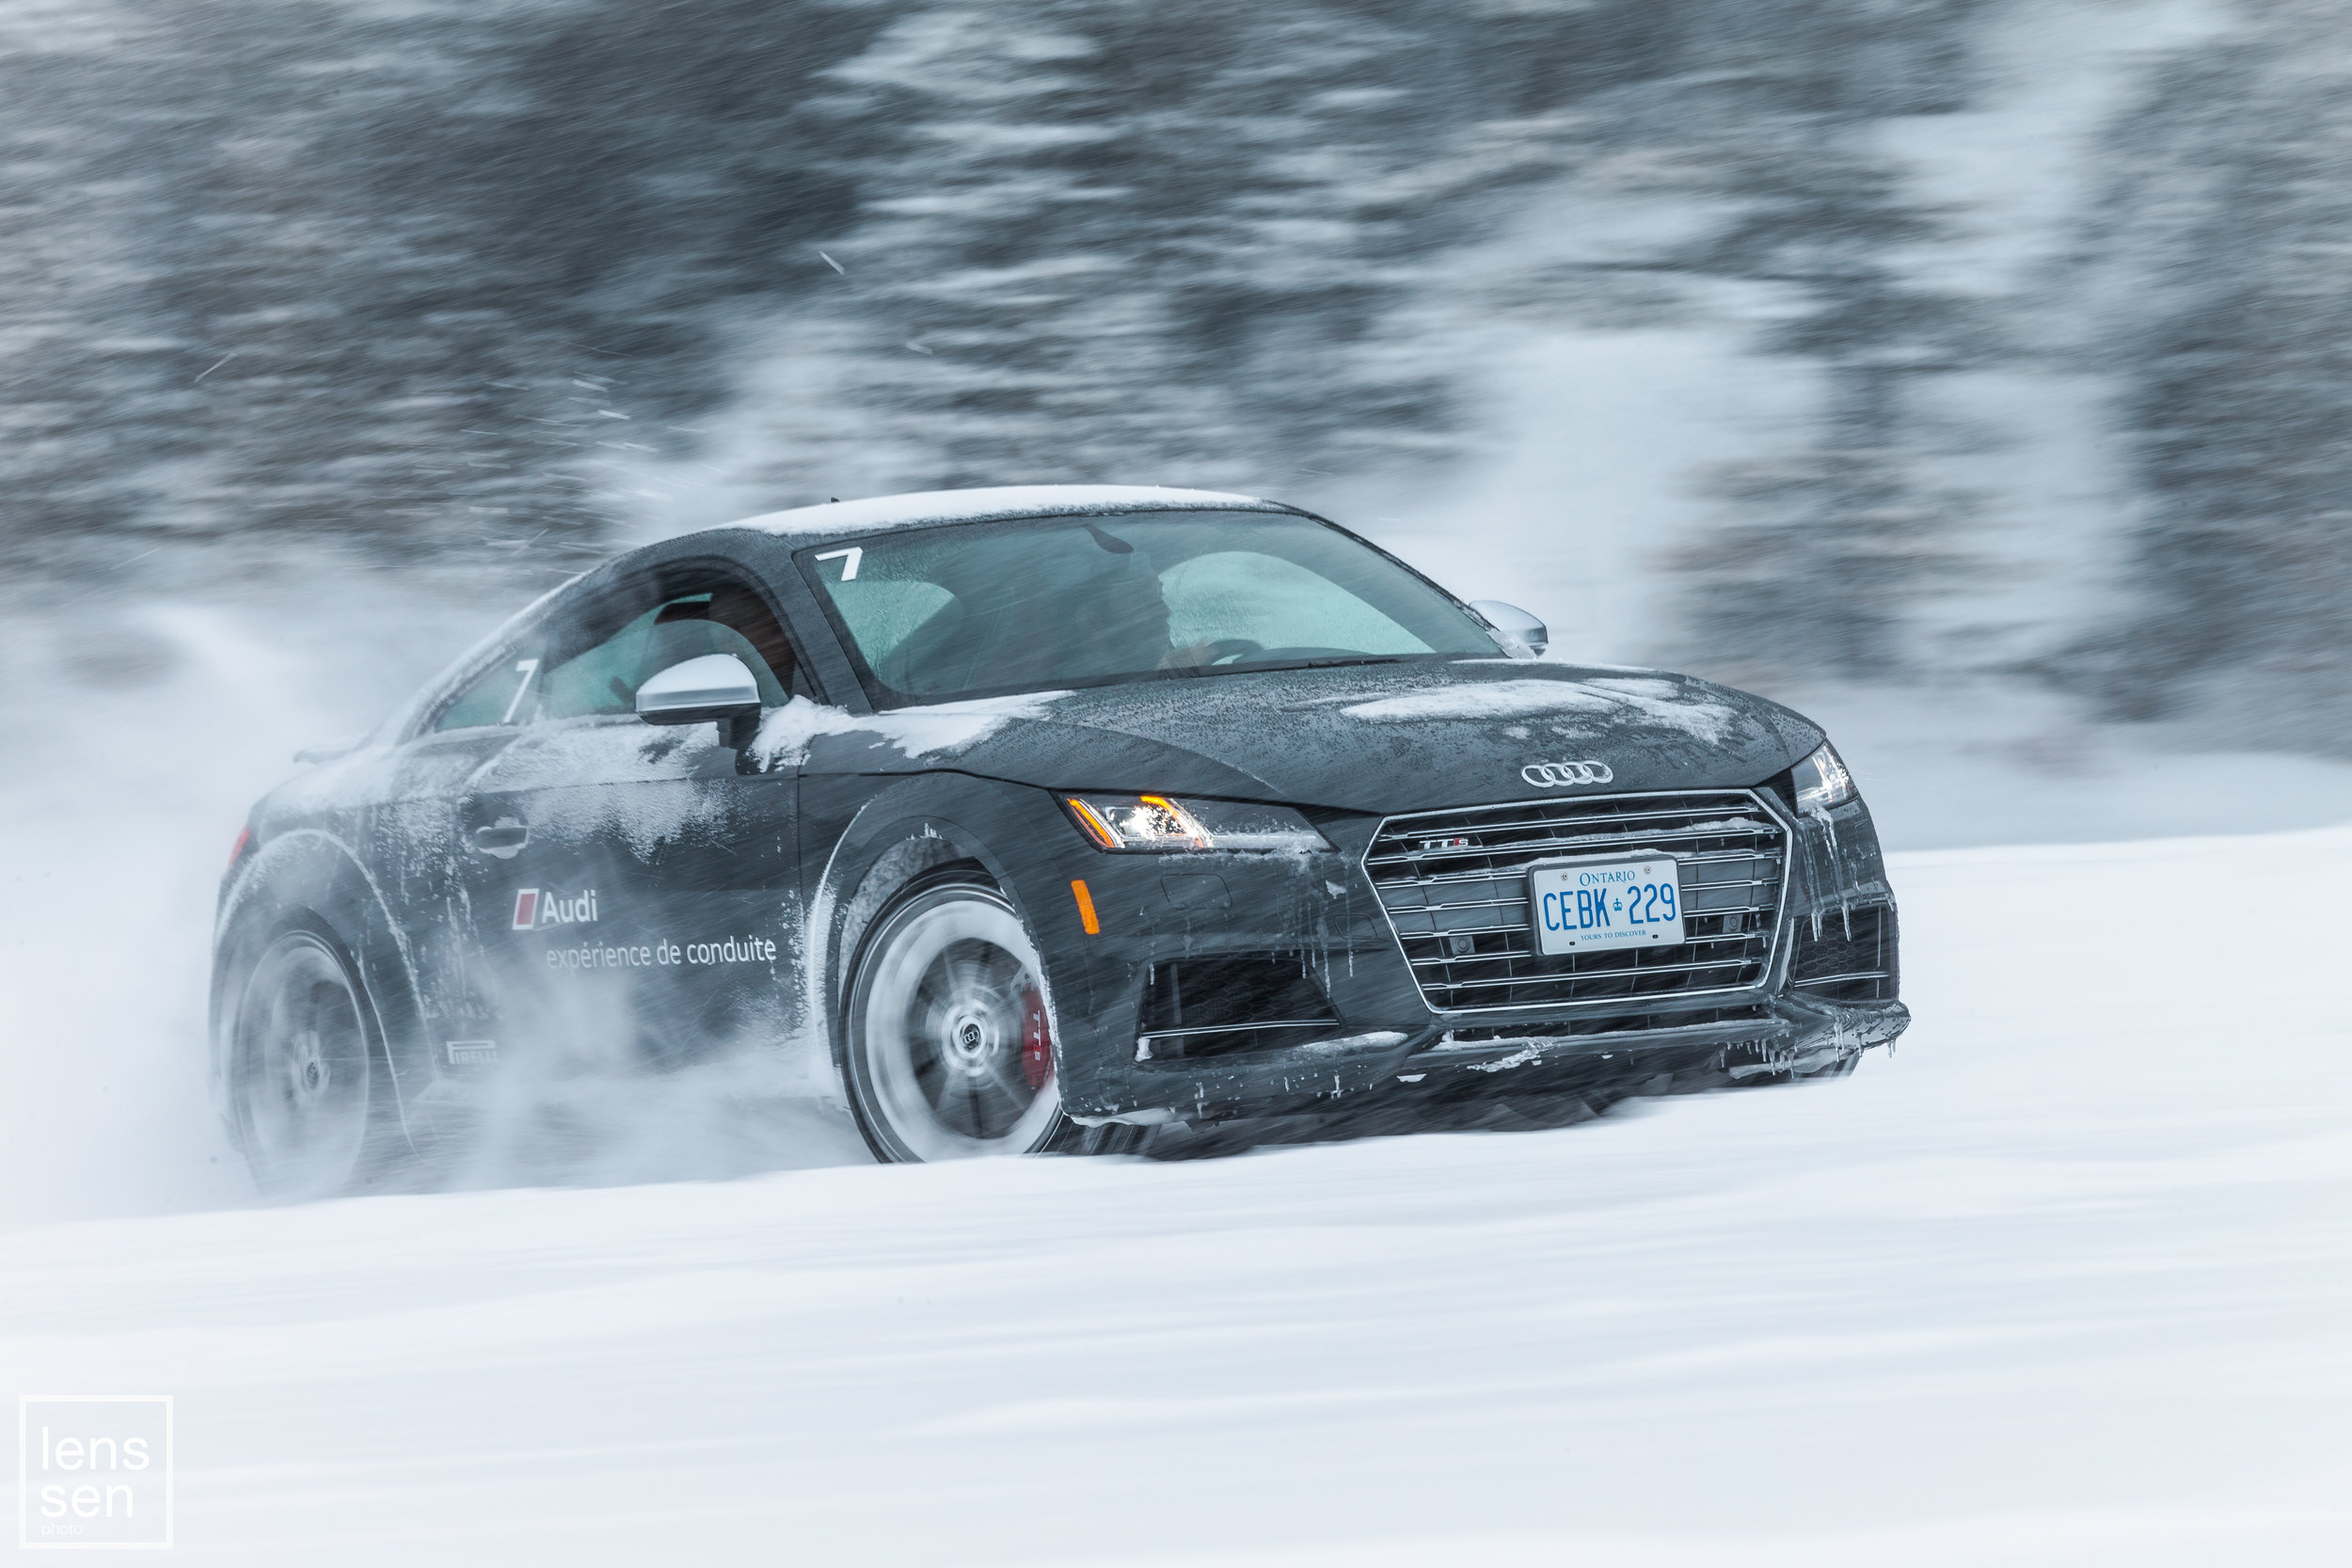 Audi Ice Experience - Sacacomie QC - Feb 2018-_L2_3569.jpg